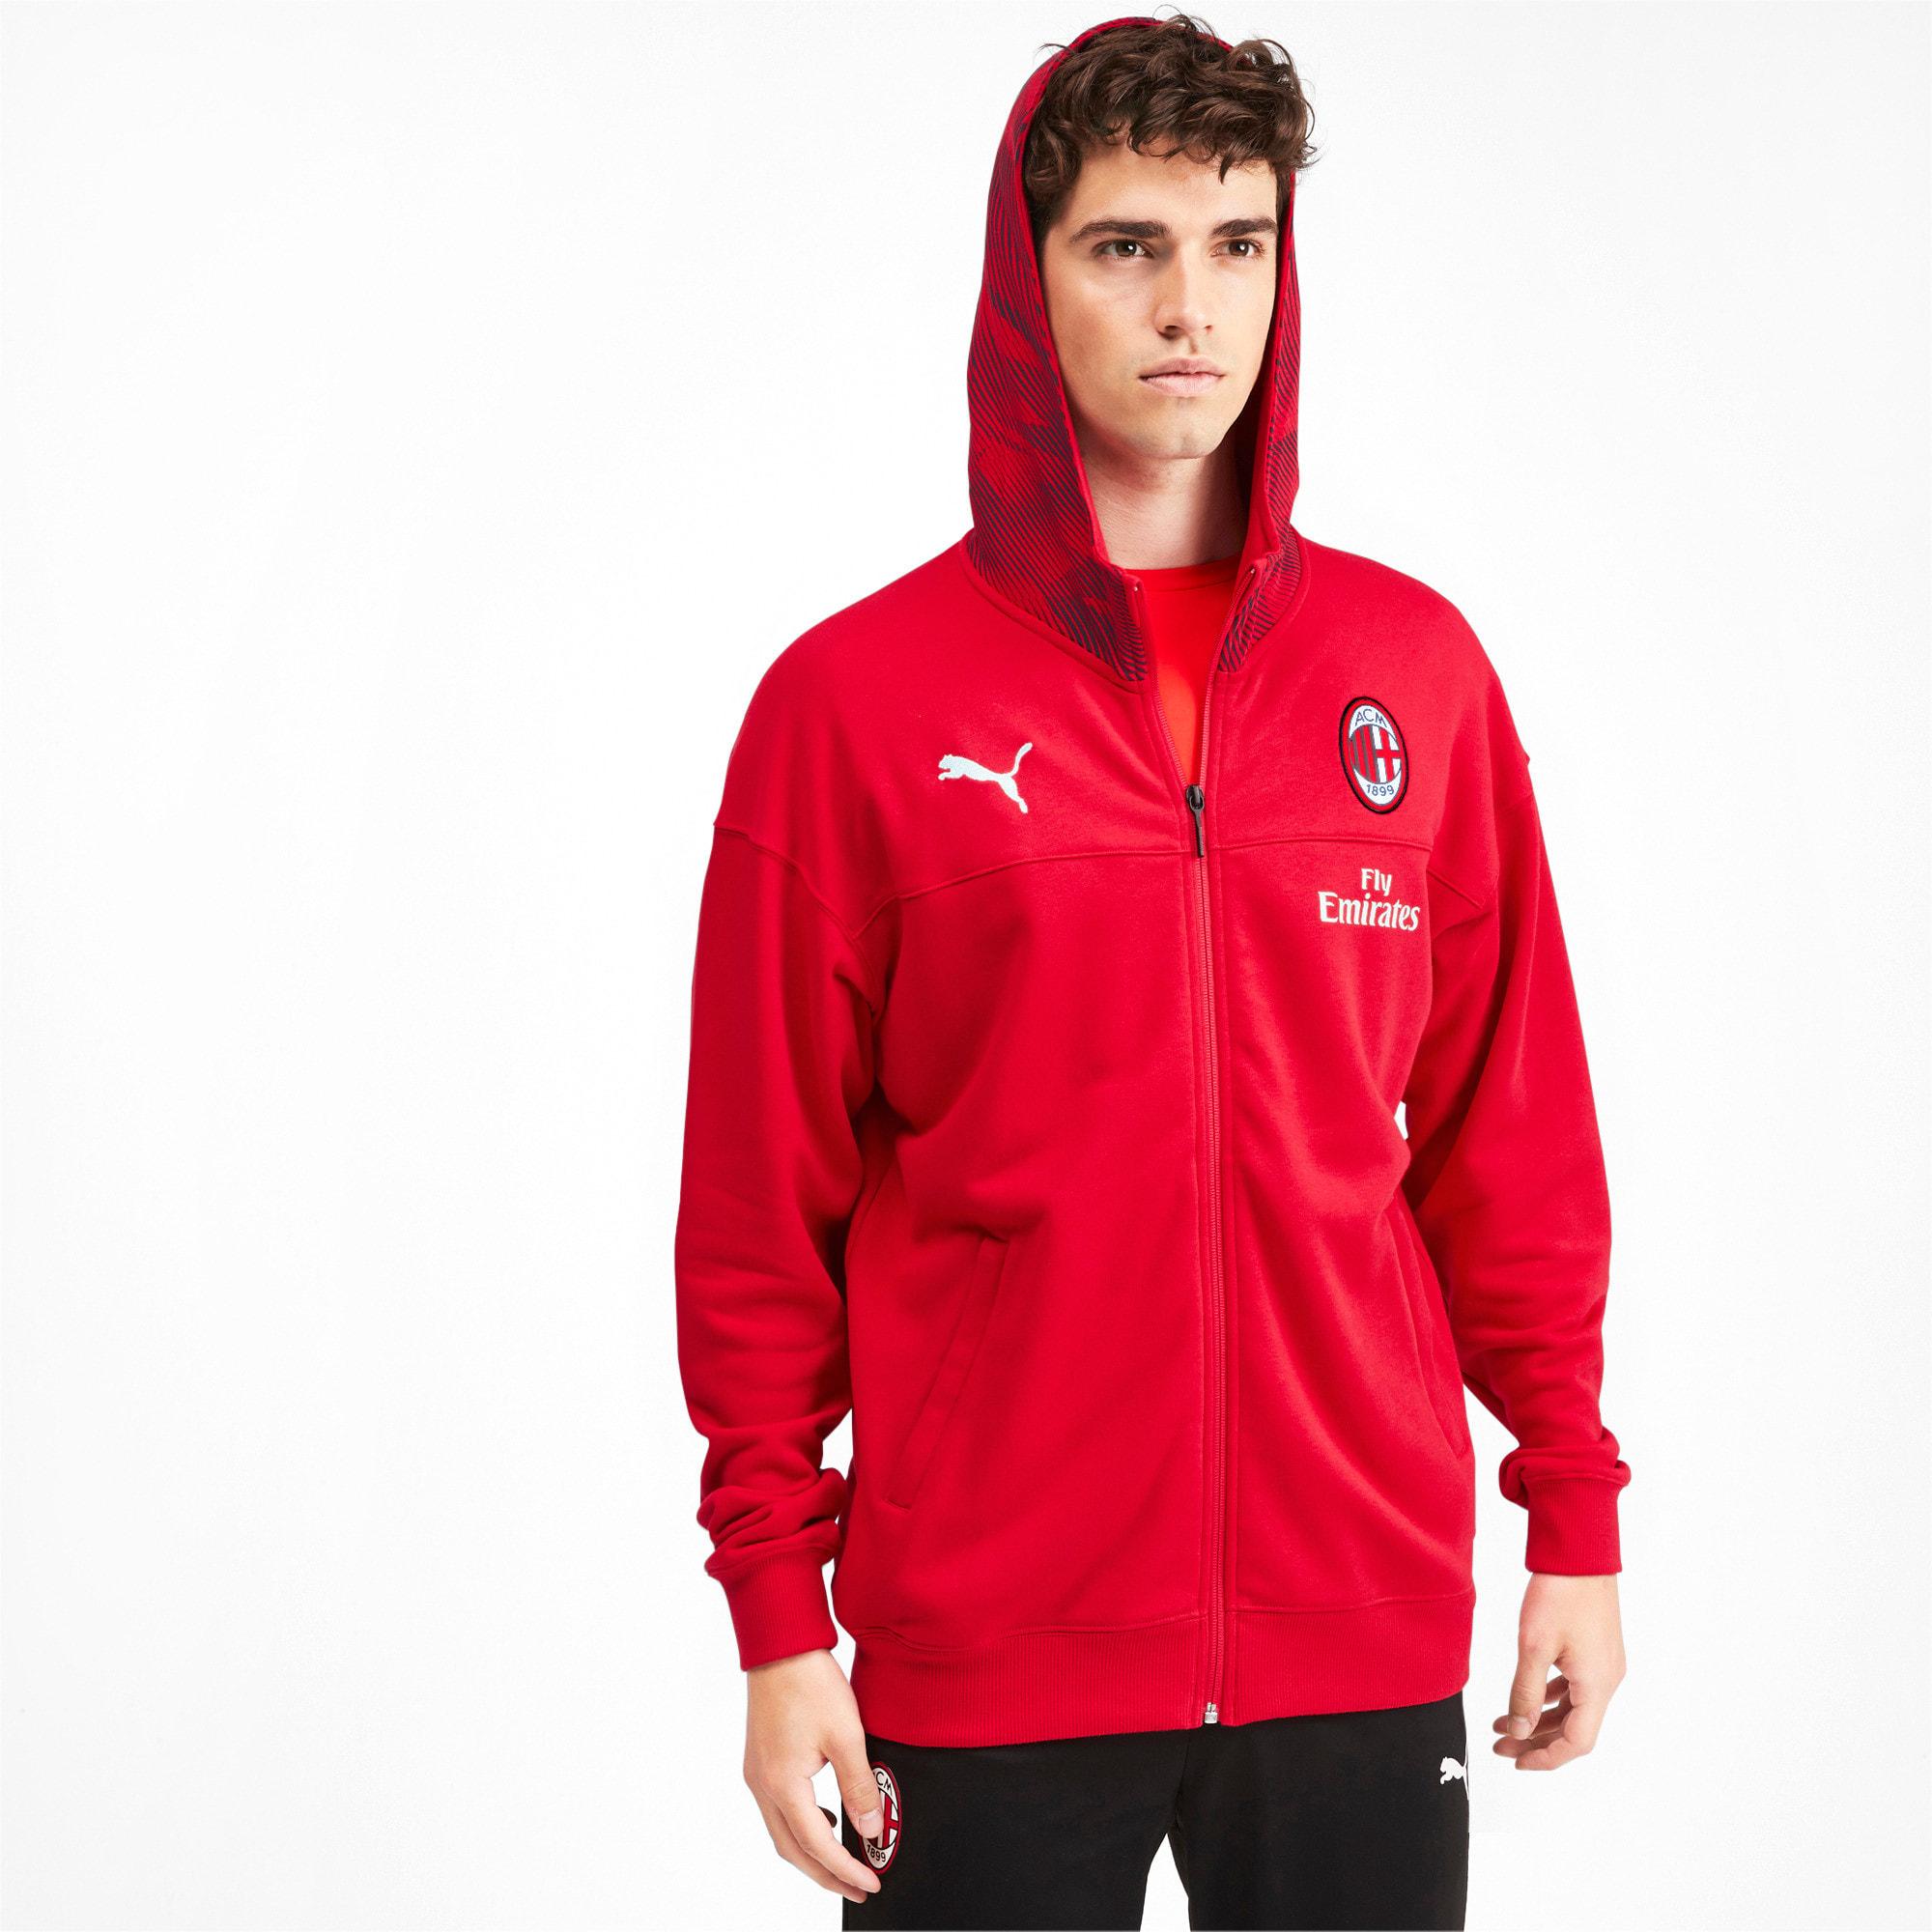 Thumbnail 1 of AC Milan Casuals Men's Hoodie, Tango Red -Puma Black, medium